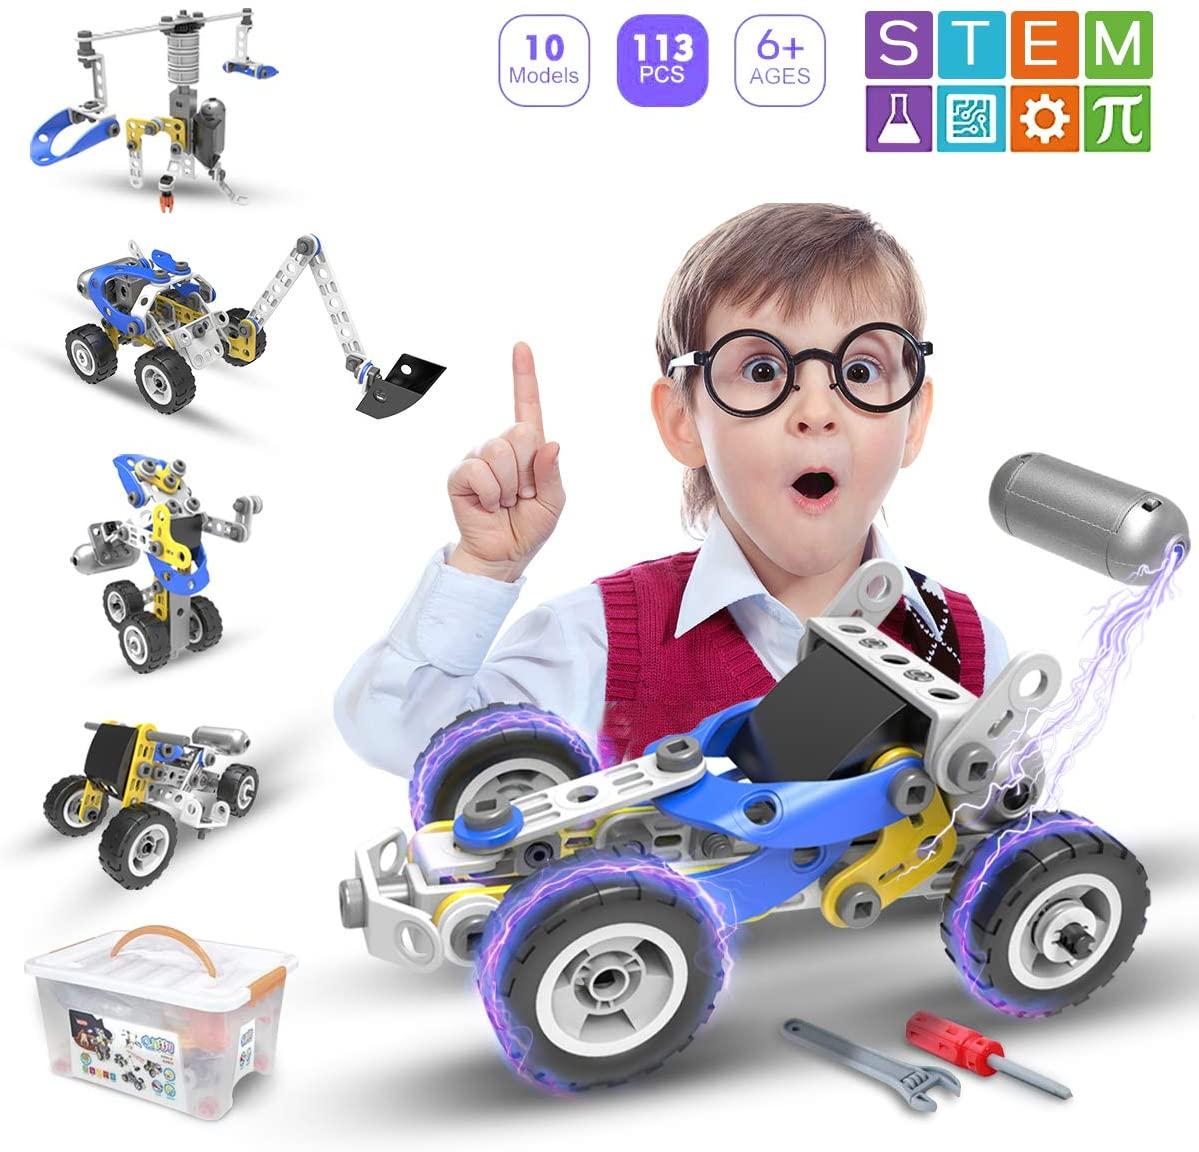 Atonofun STEM Toys Building Blocks - 5 in 1 Motorized Educational Construction Set Creative Engineering Toys Building Toys Kit Stem Learning Gift for Kids Ages 6 7 8 9 10 11 12Year Old Boys Girls